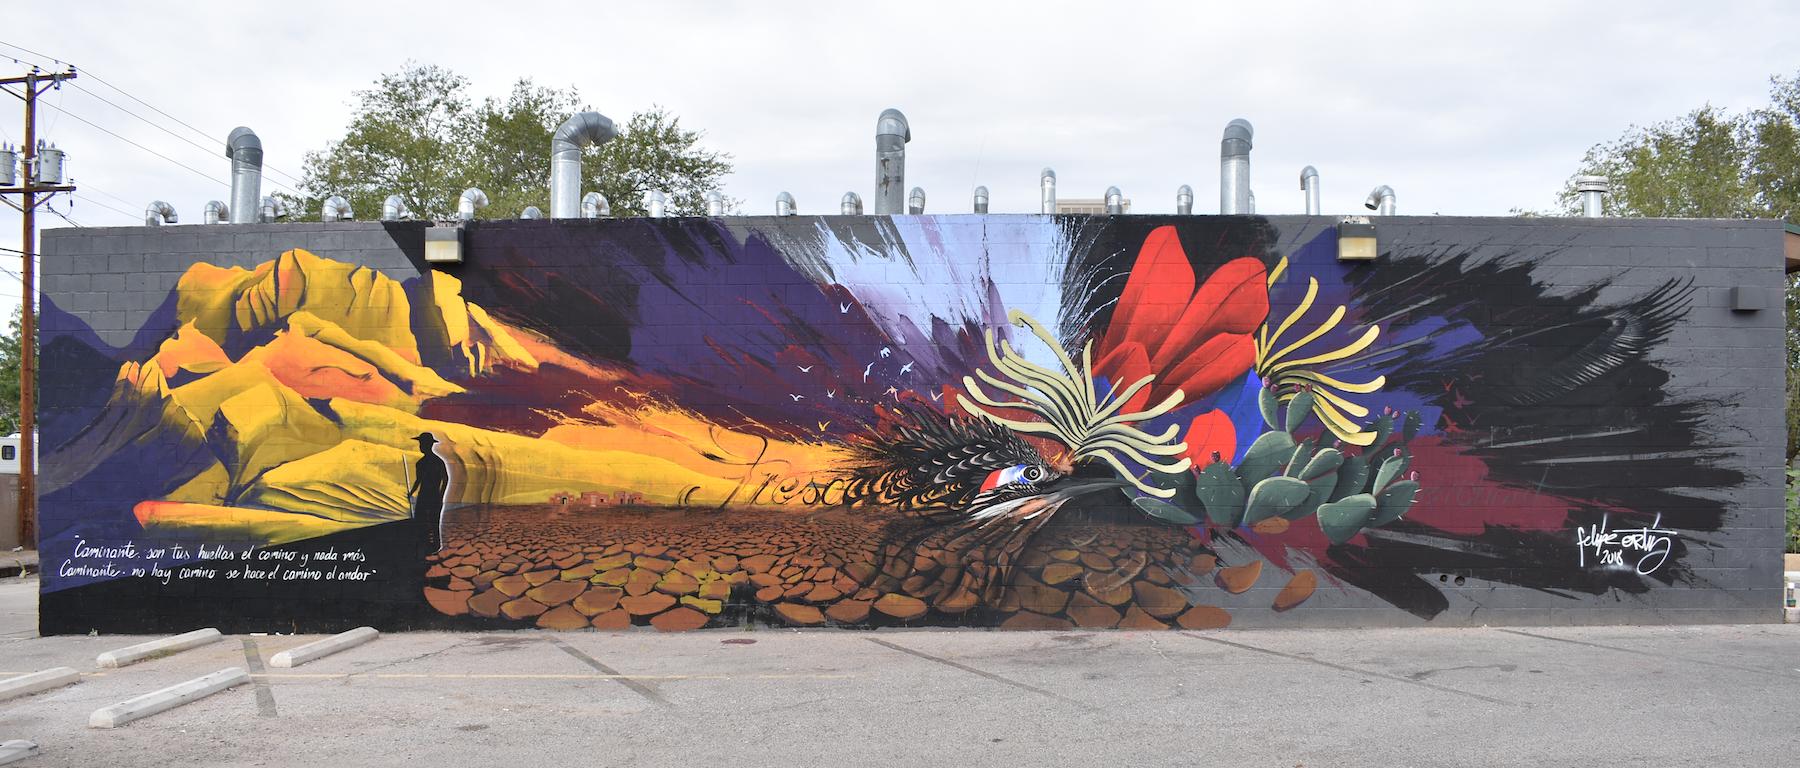 Felipe Ortiz  Flamenco Works, Albuquerque, New Mexico 2018